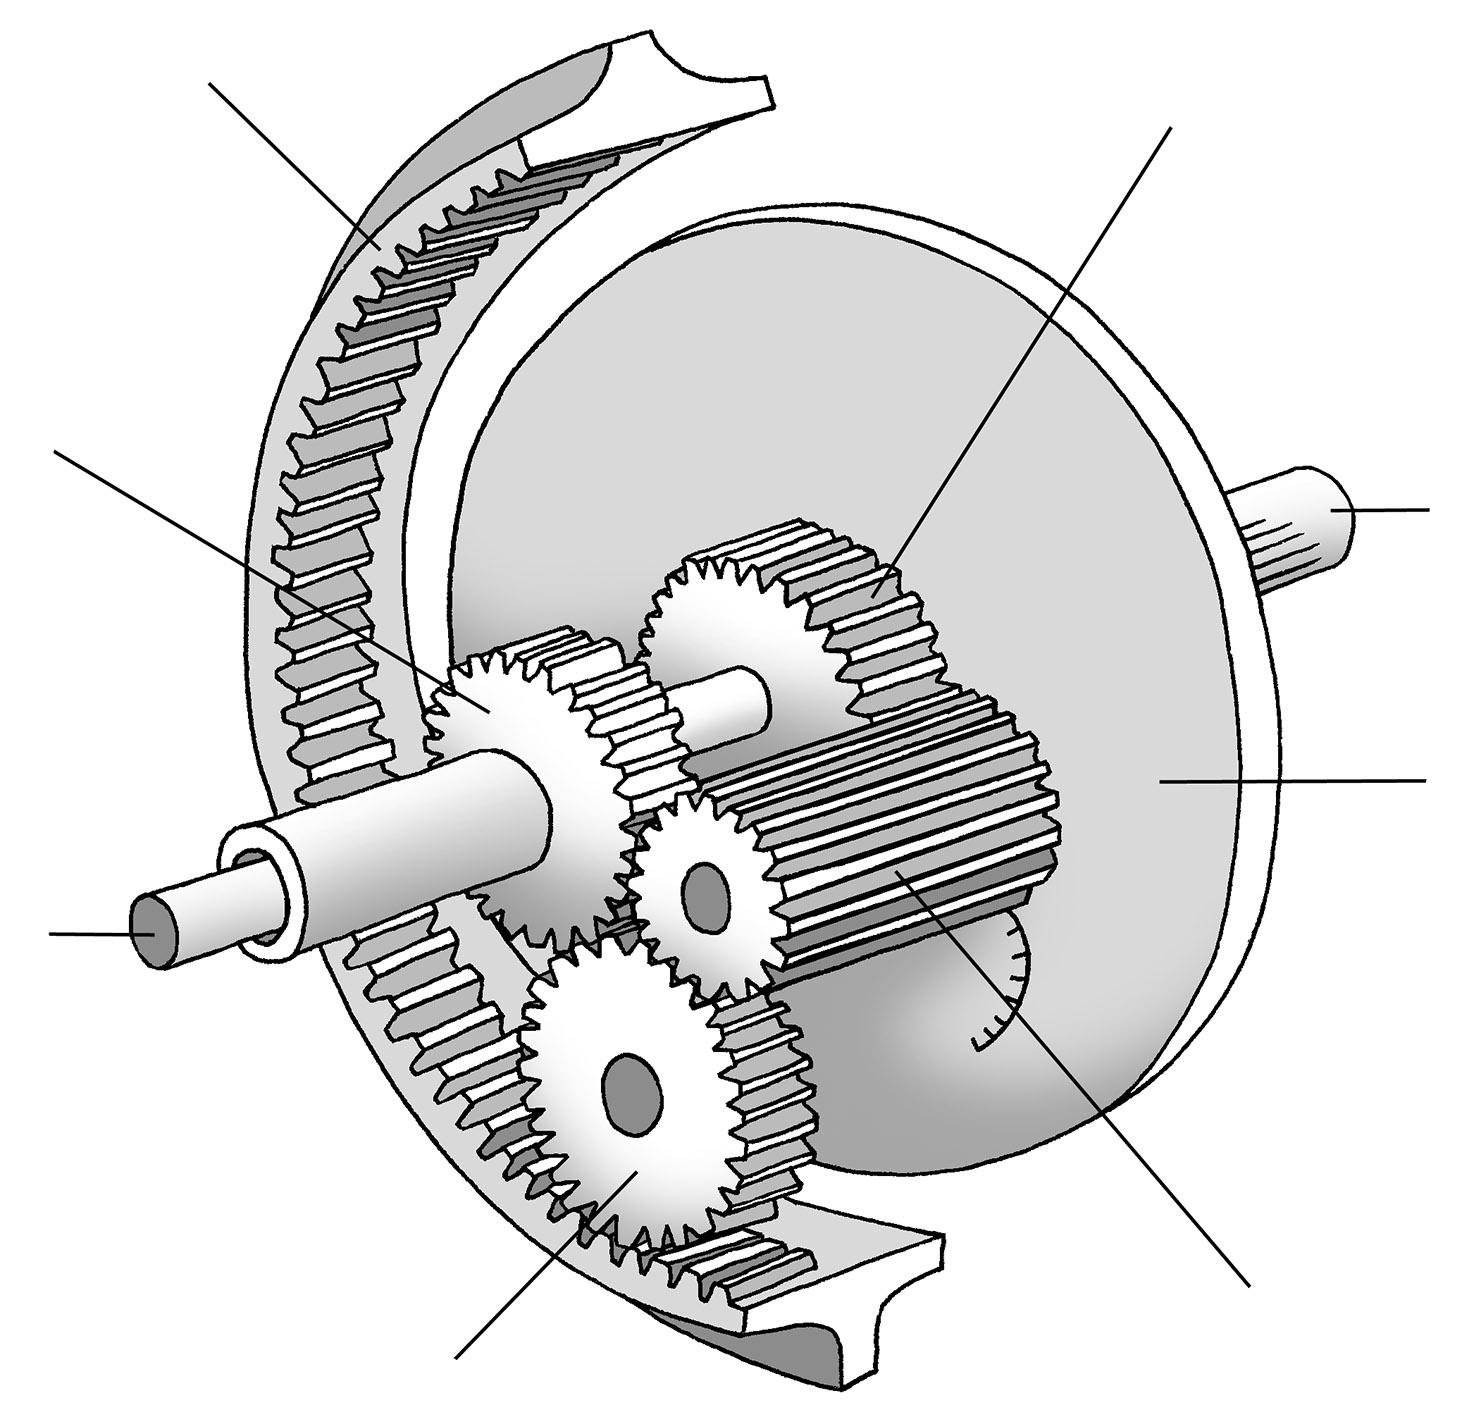 compound gear train diagram gear train diagram maker epicyclic gear train | jane smith's blog